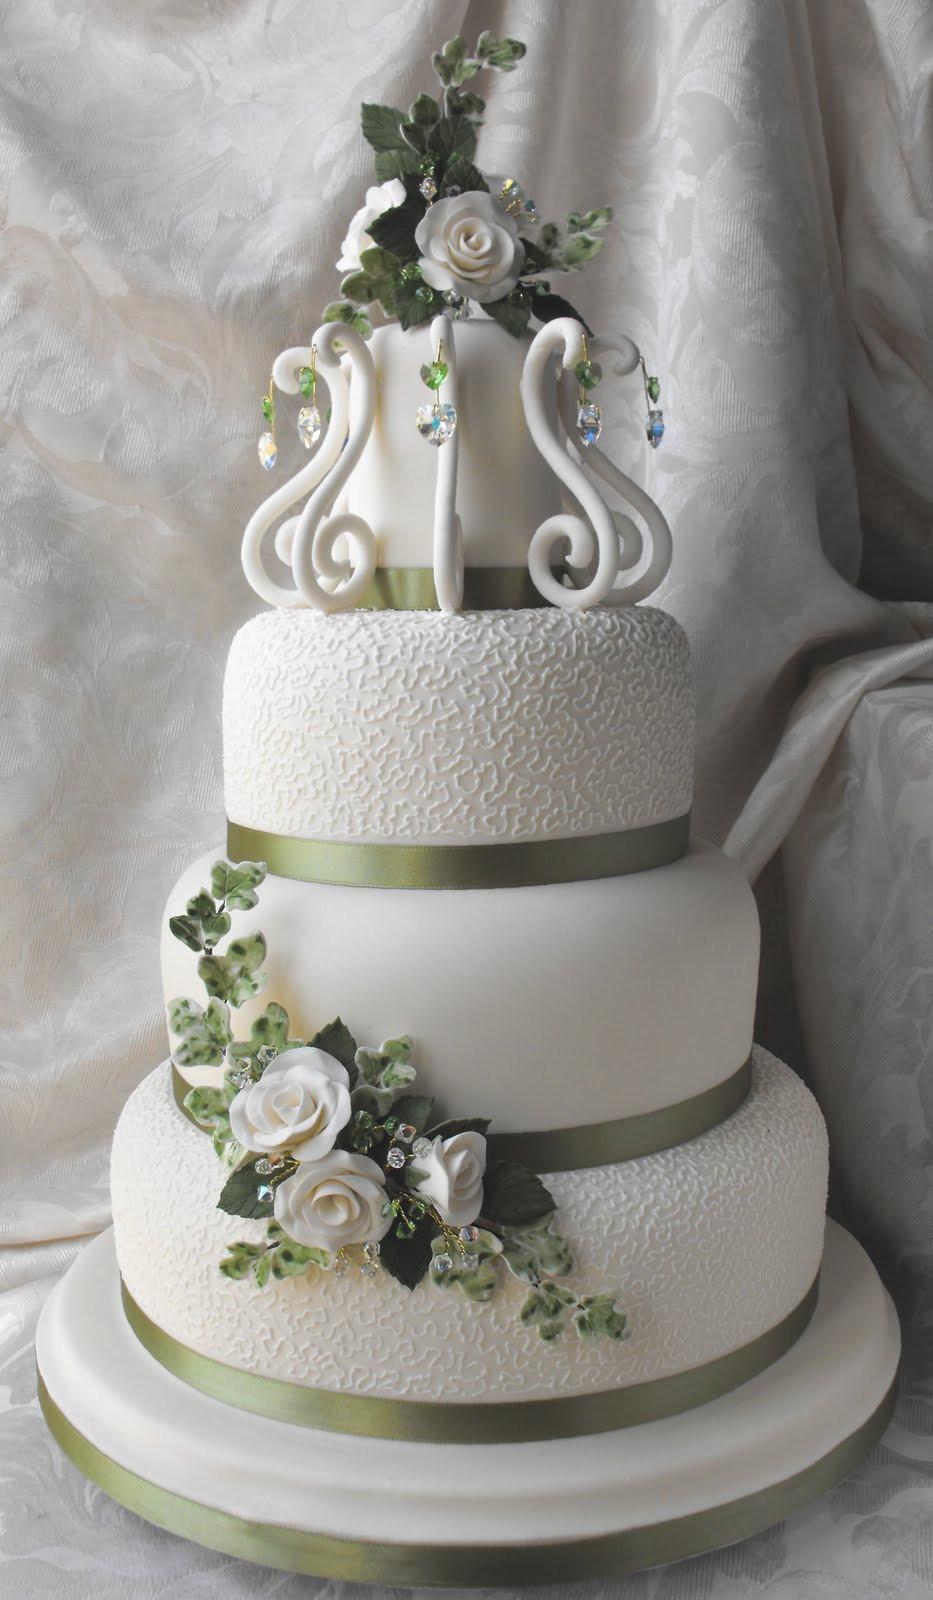 Stunning Wedding Cakes  Stunning Wedding Cake Cake Idea Red Velvet